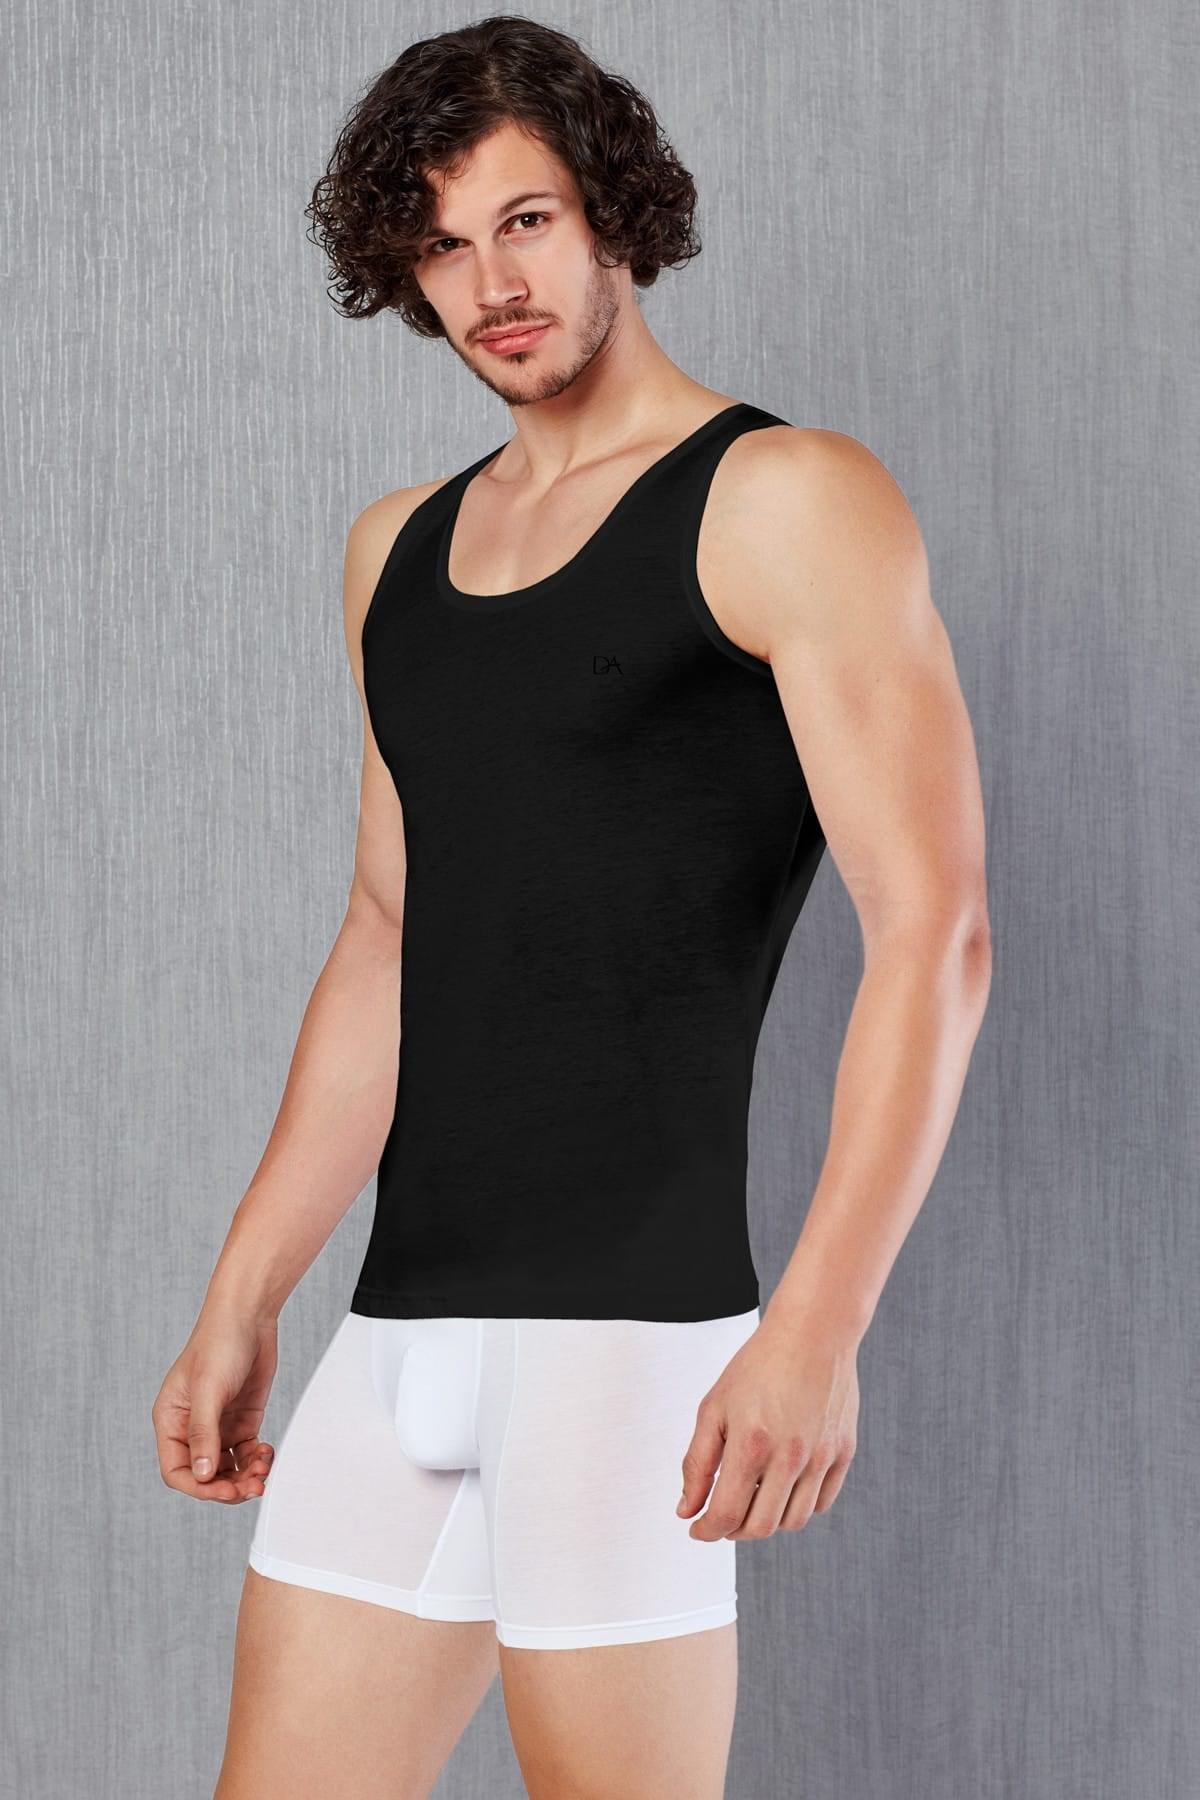 Man Undershirt 2025